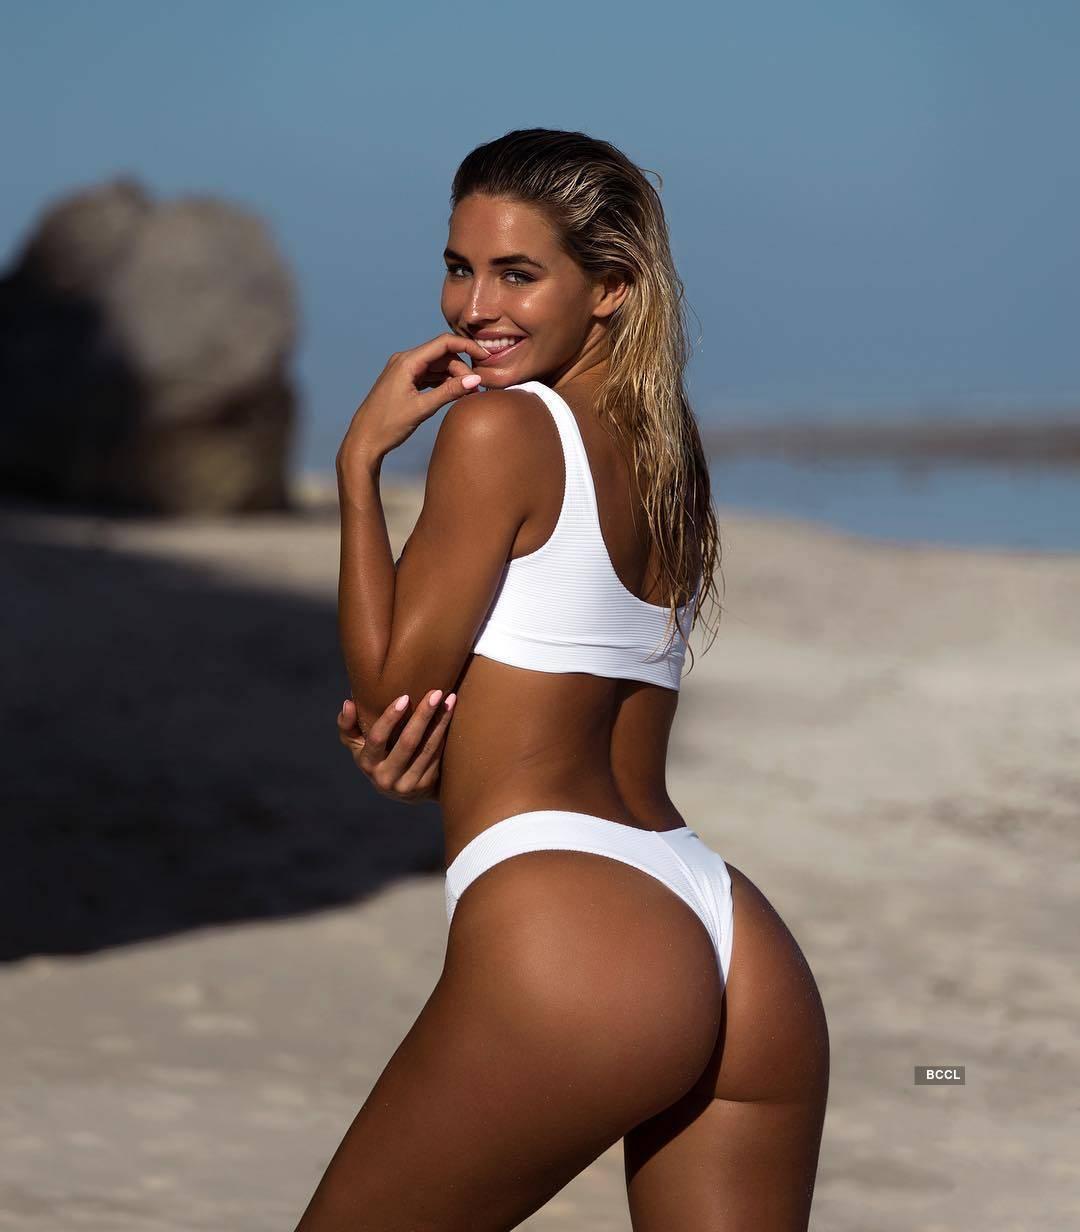 Madi Edwards, the beach beauty